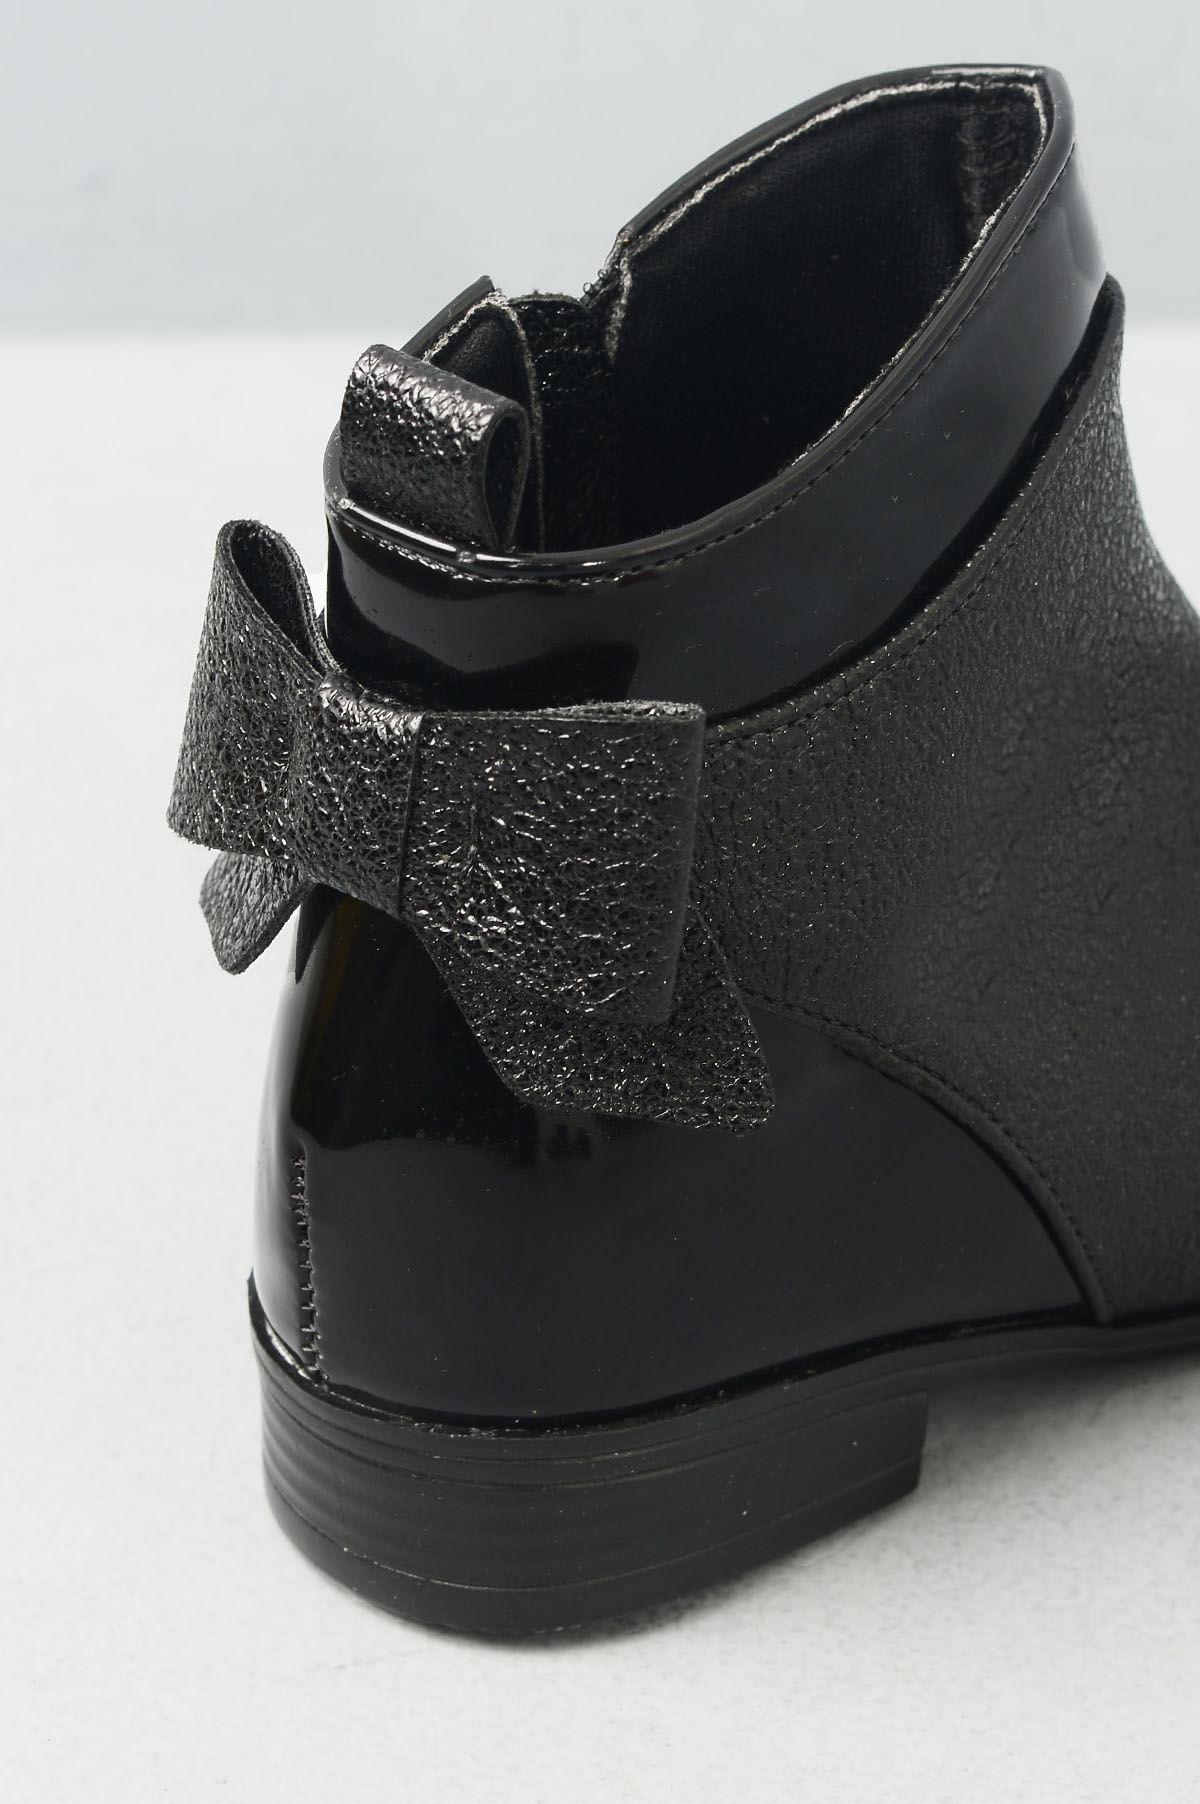 84a8c5461 Bota Infantil Barbara Mundial SINT - PRETO - Mundial Calçados